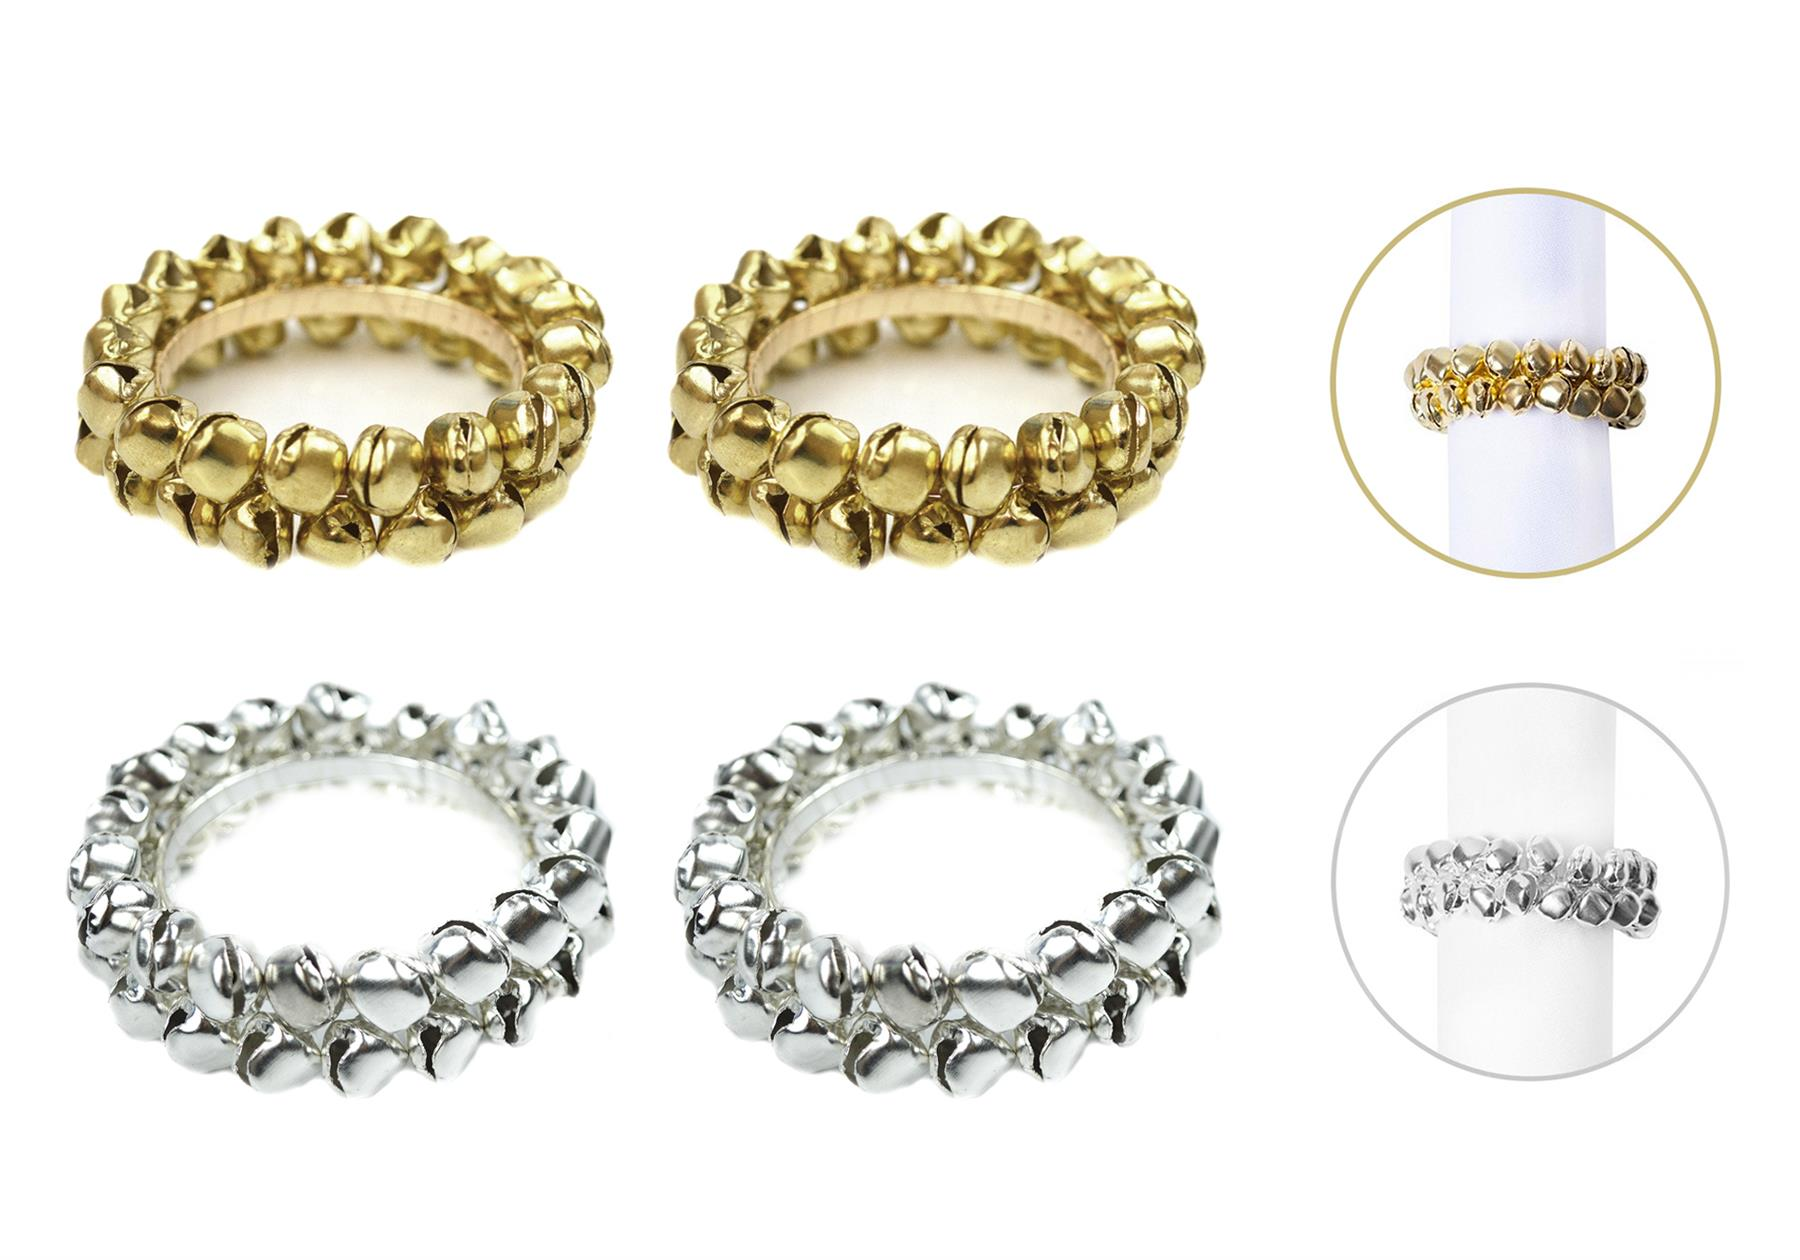 Napkin Rings Set Of 6 Gold Silver Napkin Holders Xmas Party Tableware Serviette Ebay